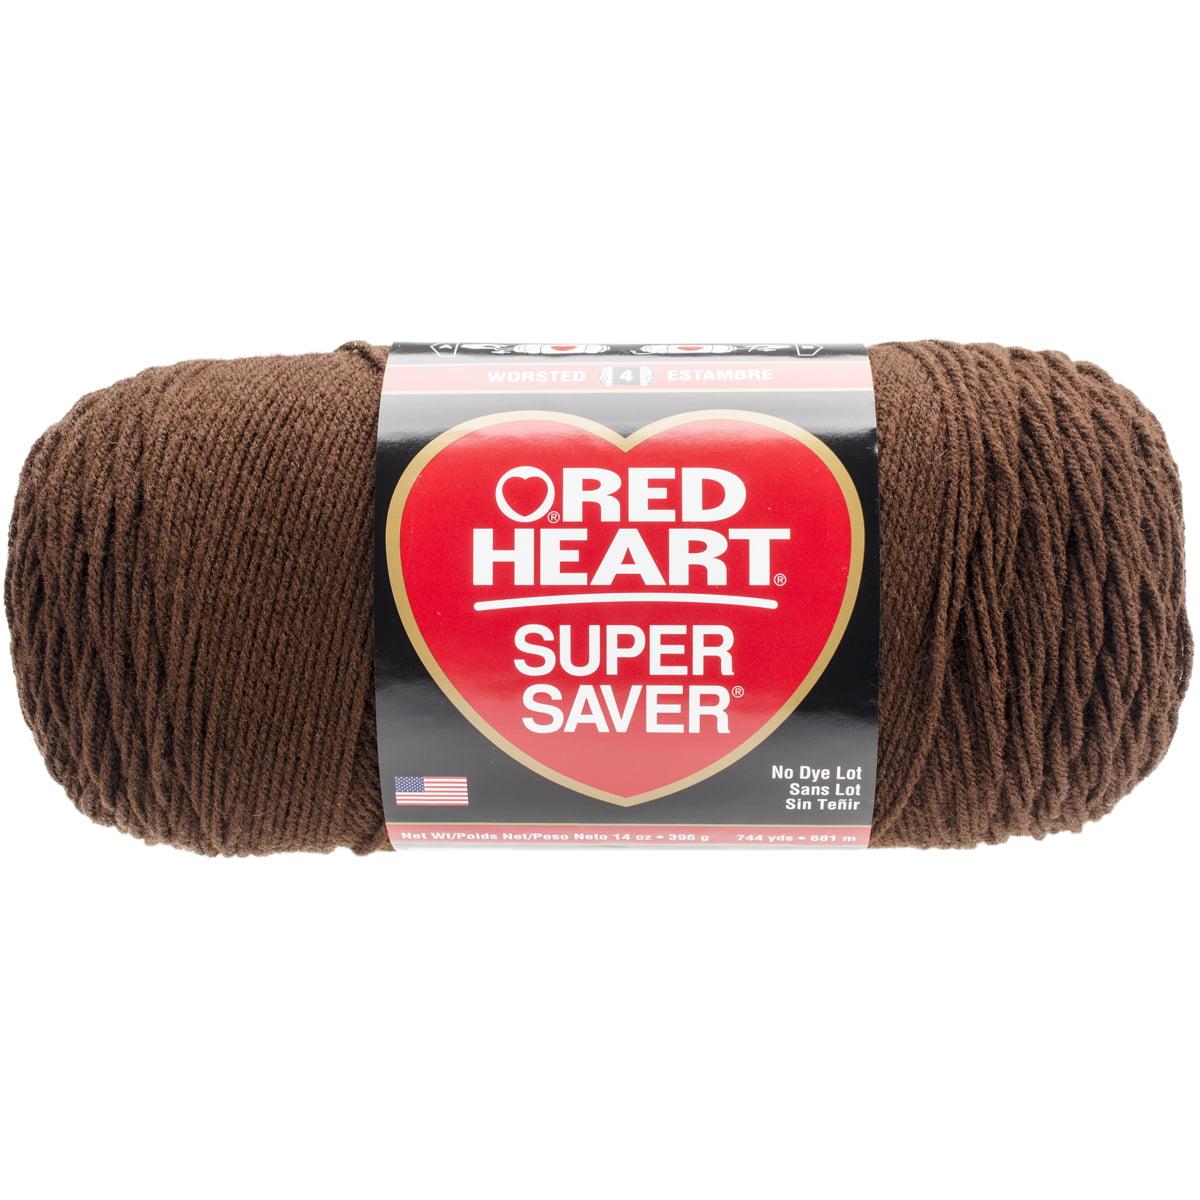 Red Heart Super Saver Acrylic Coats Coffee Yarn, 1 Each